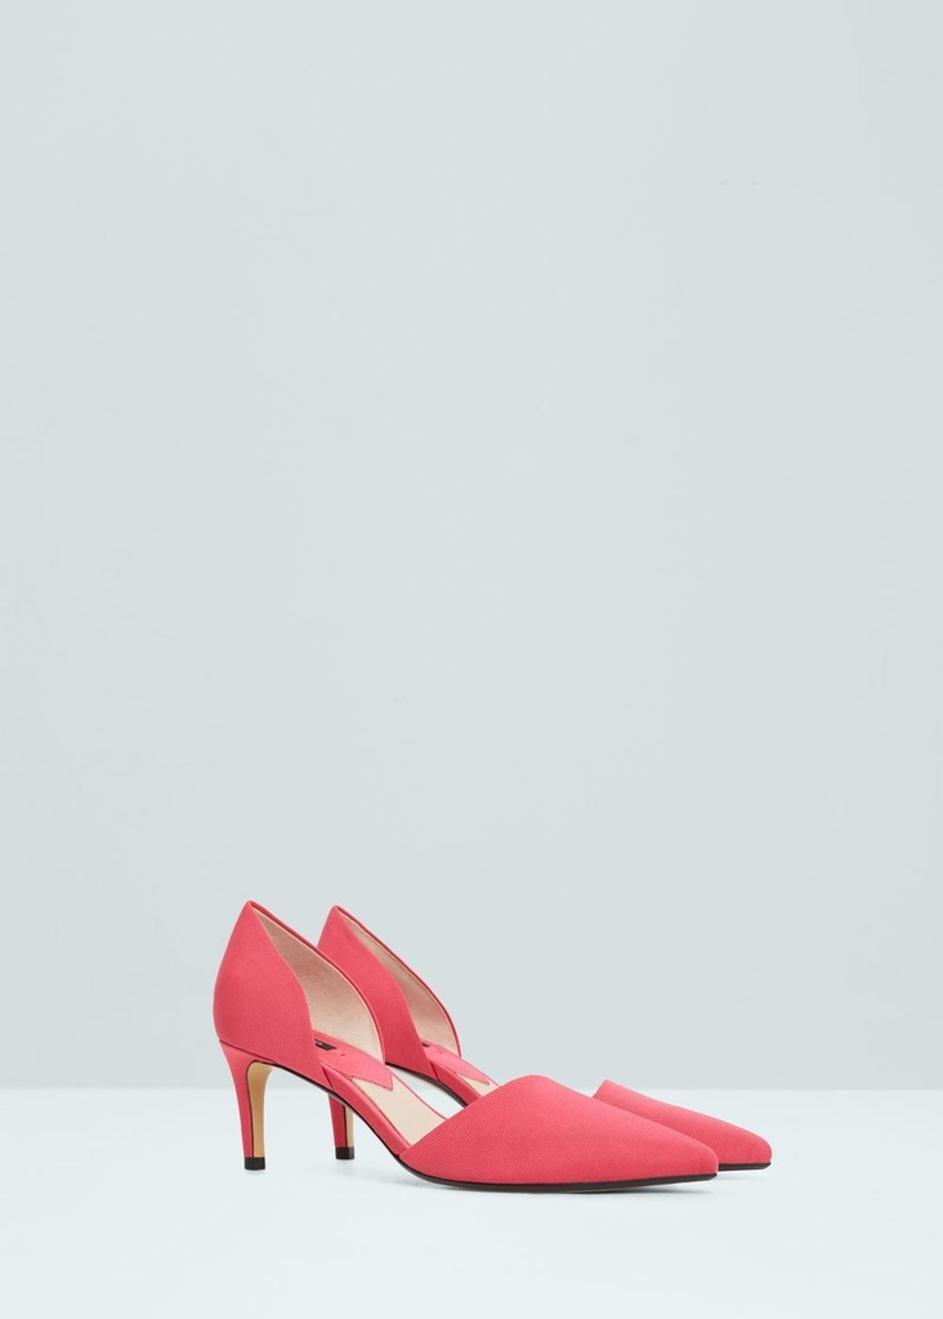 5e36af53ee6 Galerija: - title   shoes   Shoes heels, Pointed toe pumps, Women's ...